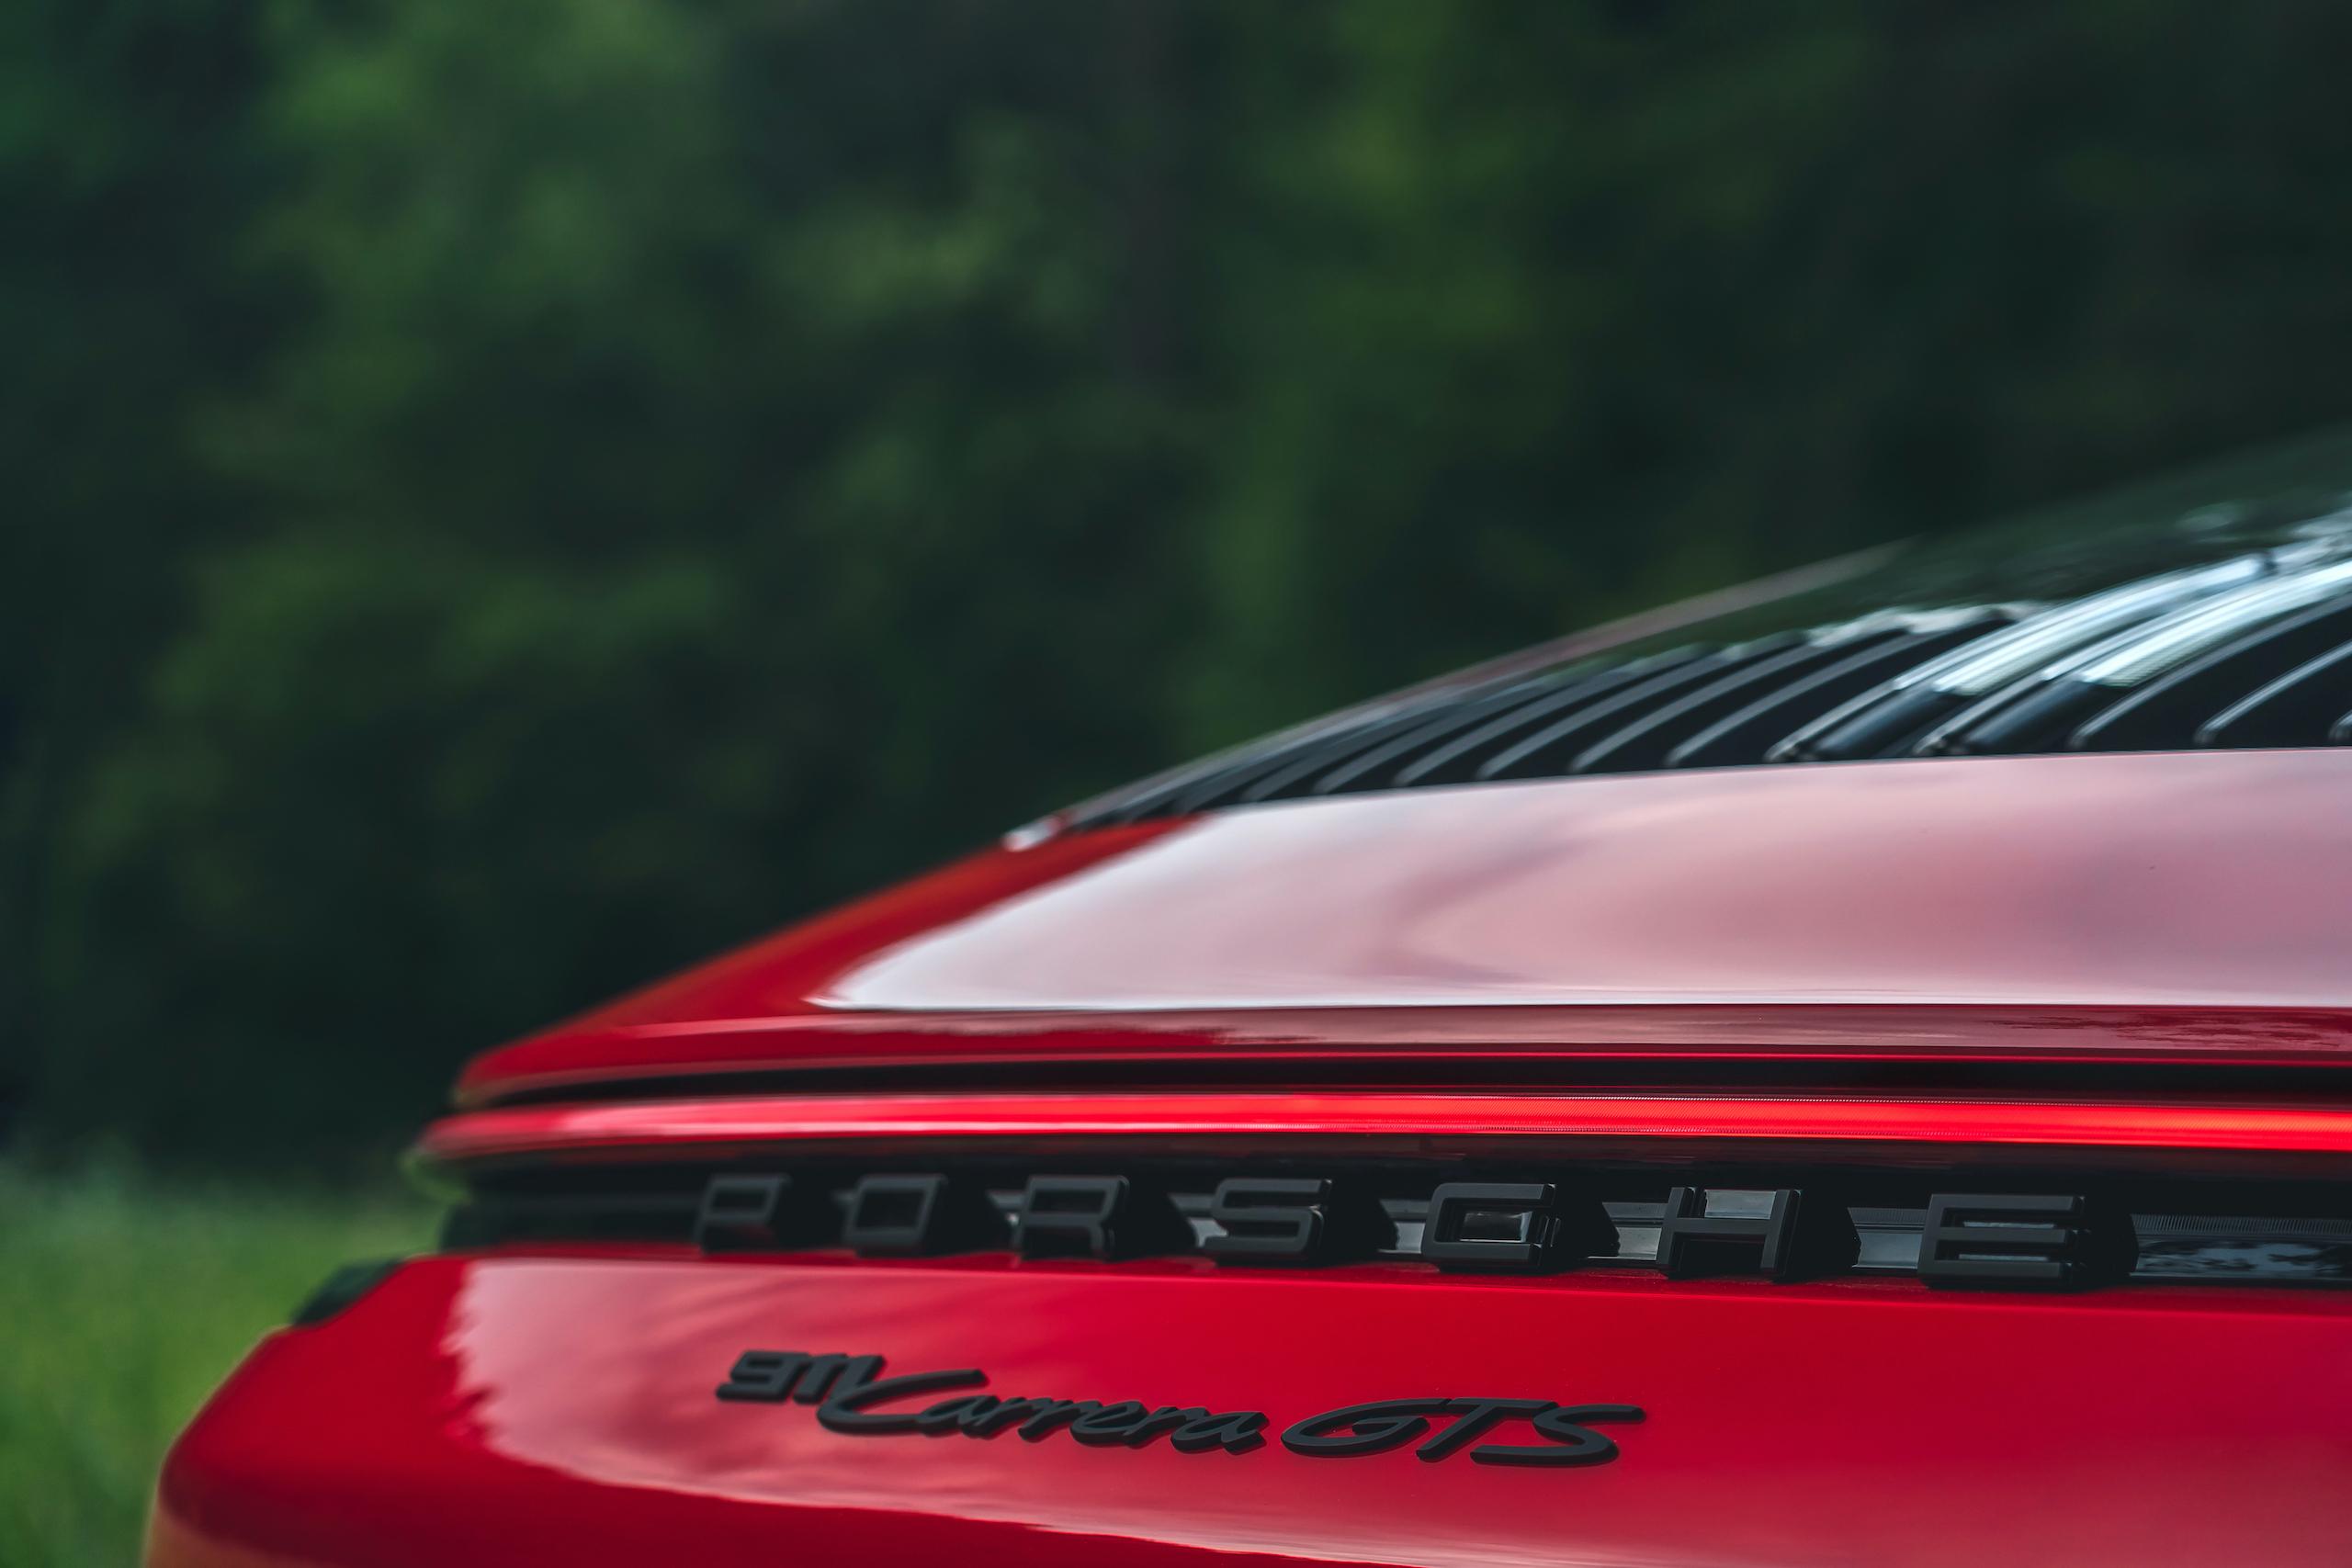 Porsche 911 GTS rear badge detail